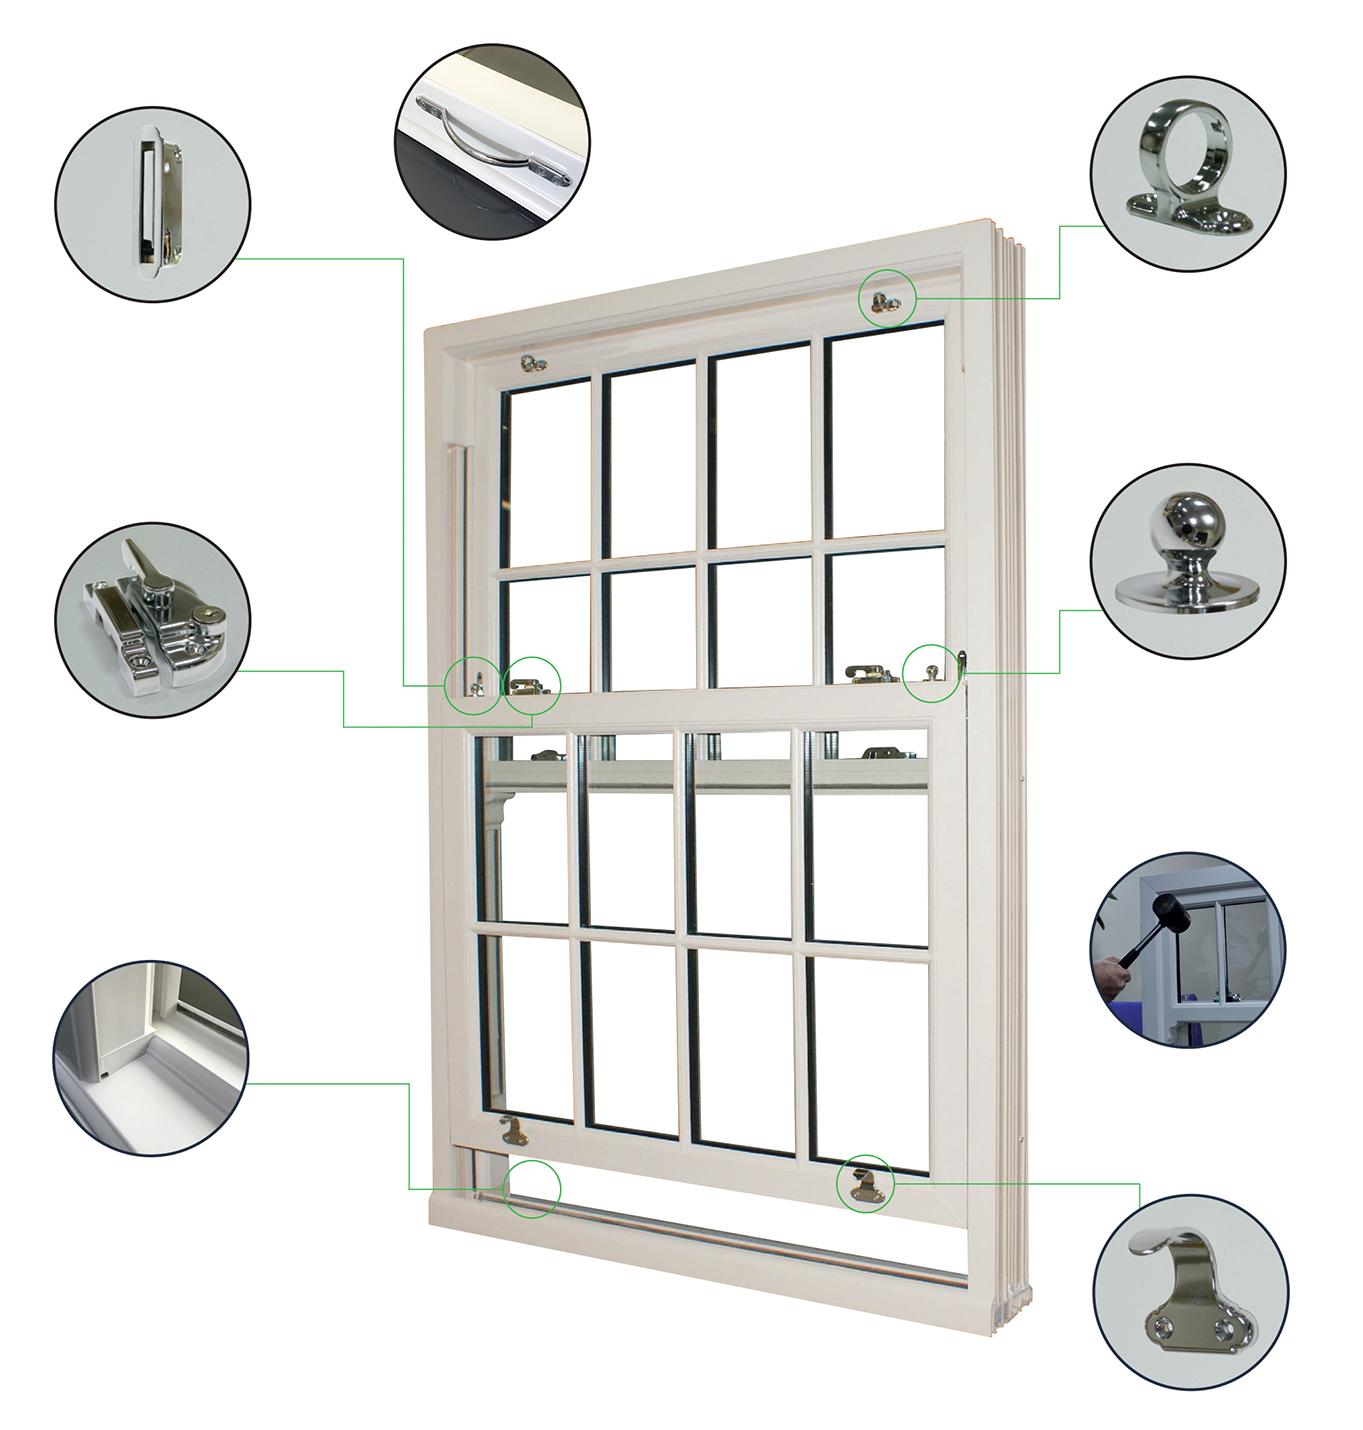 D'Best ECO Slide Sash windows Vertical Sliding Sash Windows, Stylish, secure and energy efficient